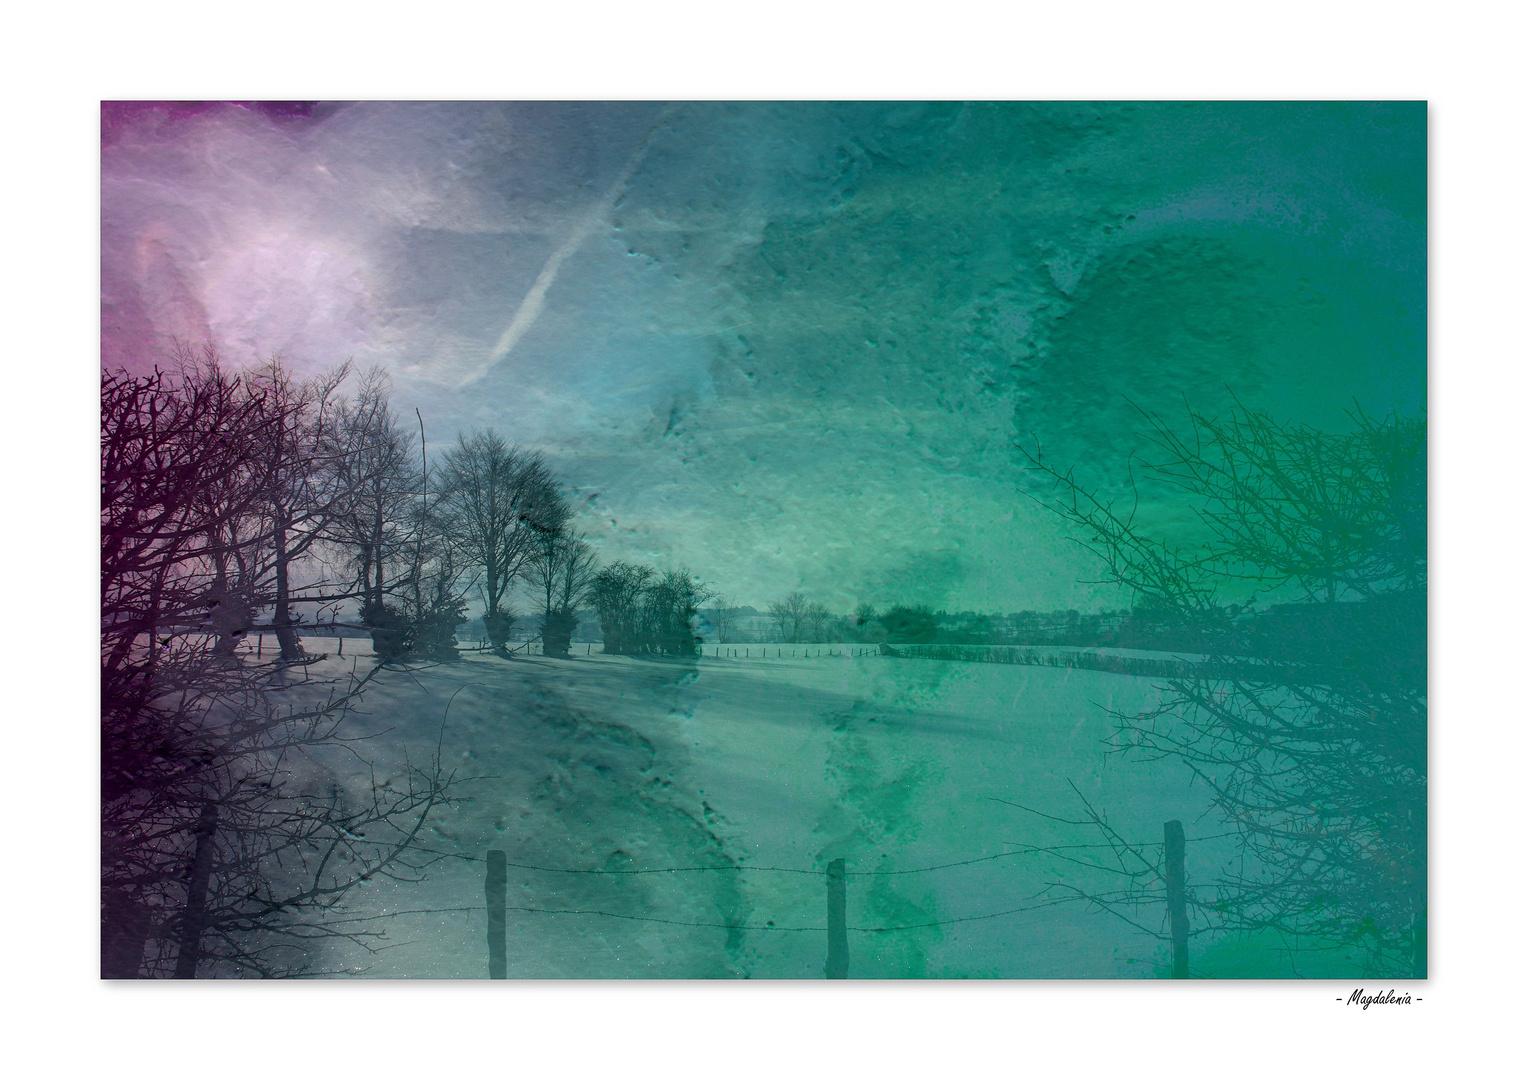 Fantaisie hivernale